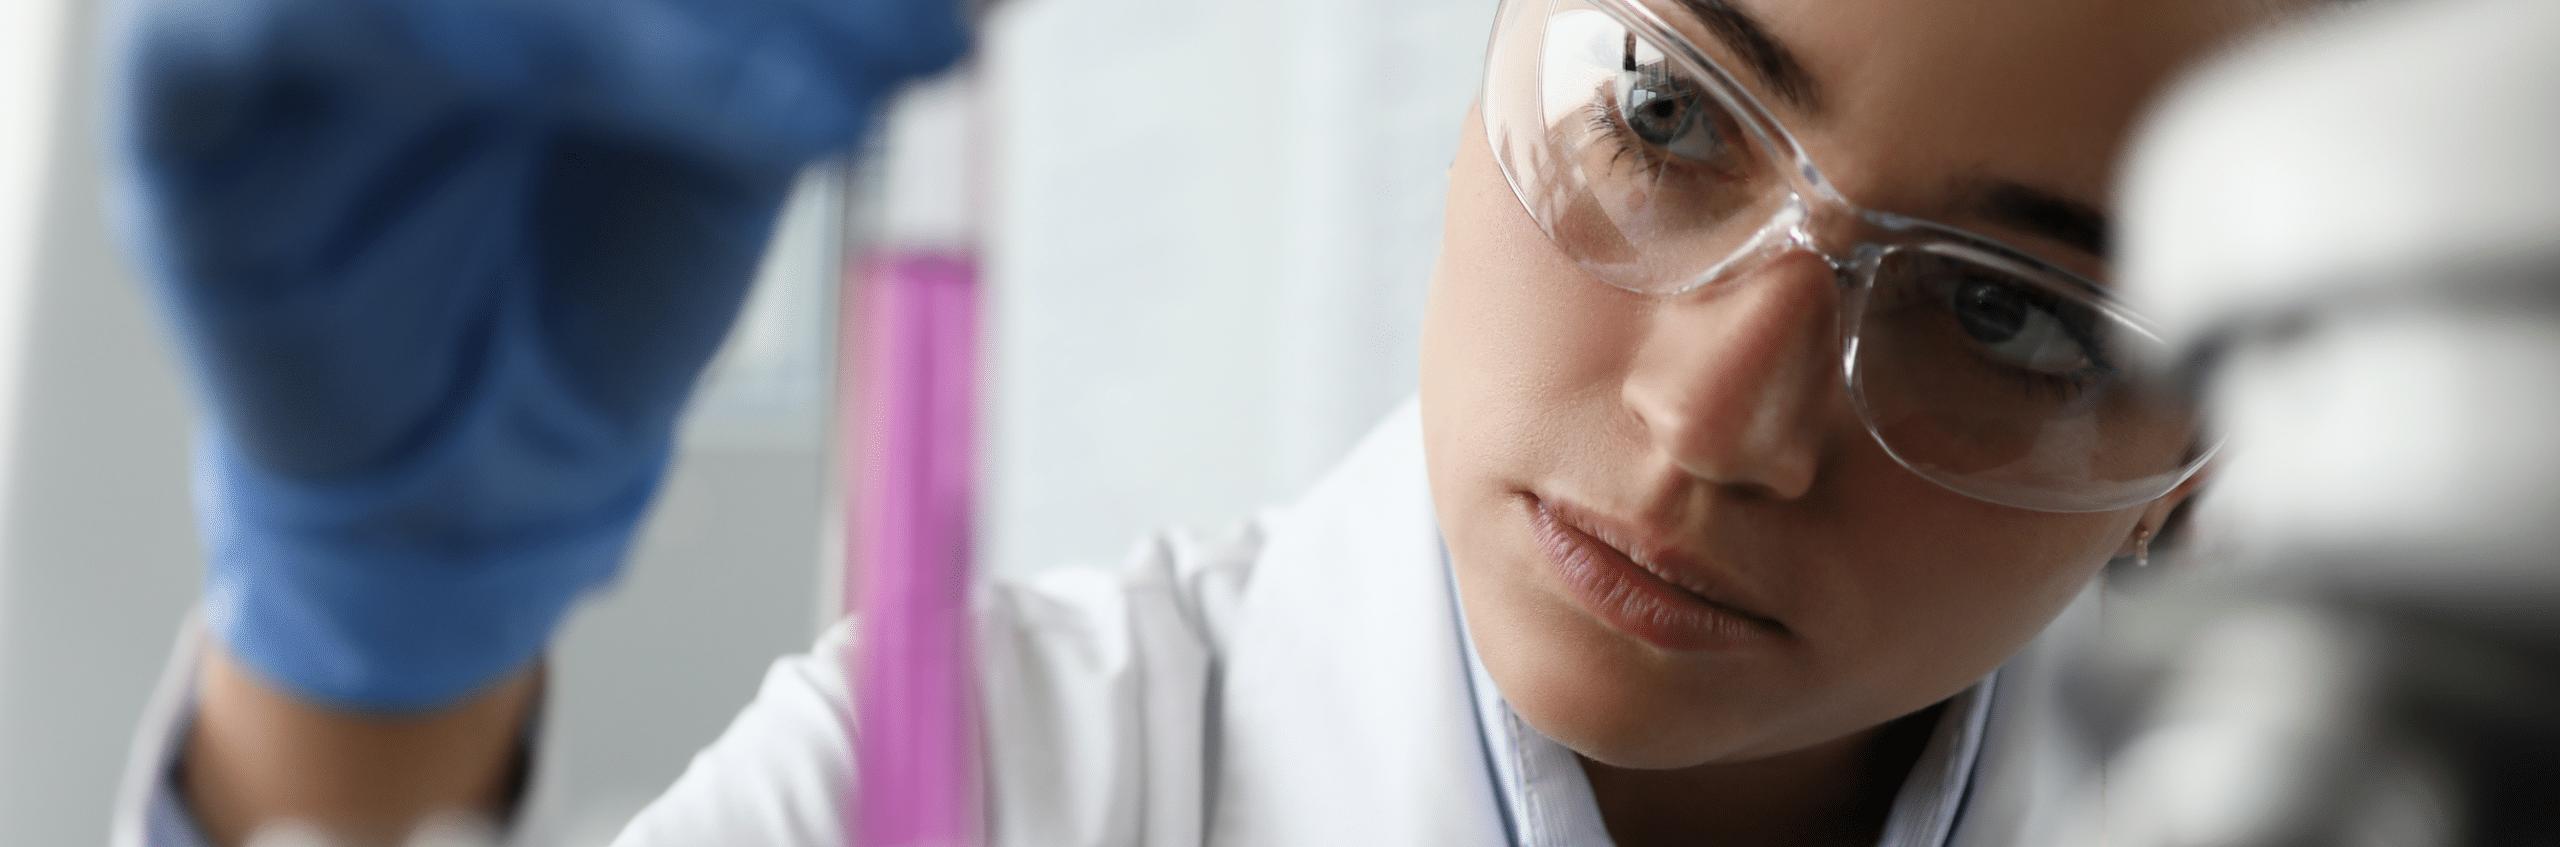 Pharma-Marketing, Labor